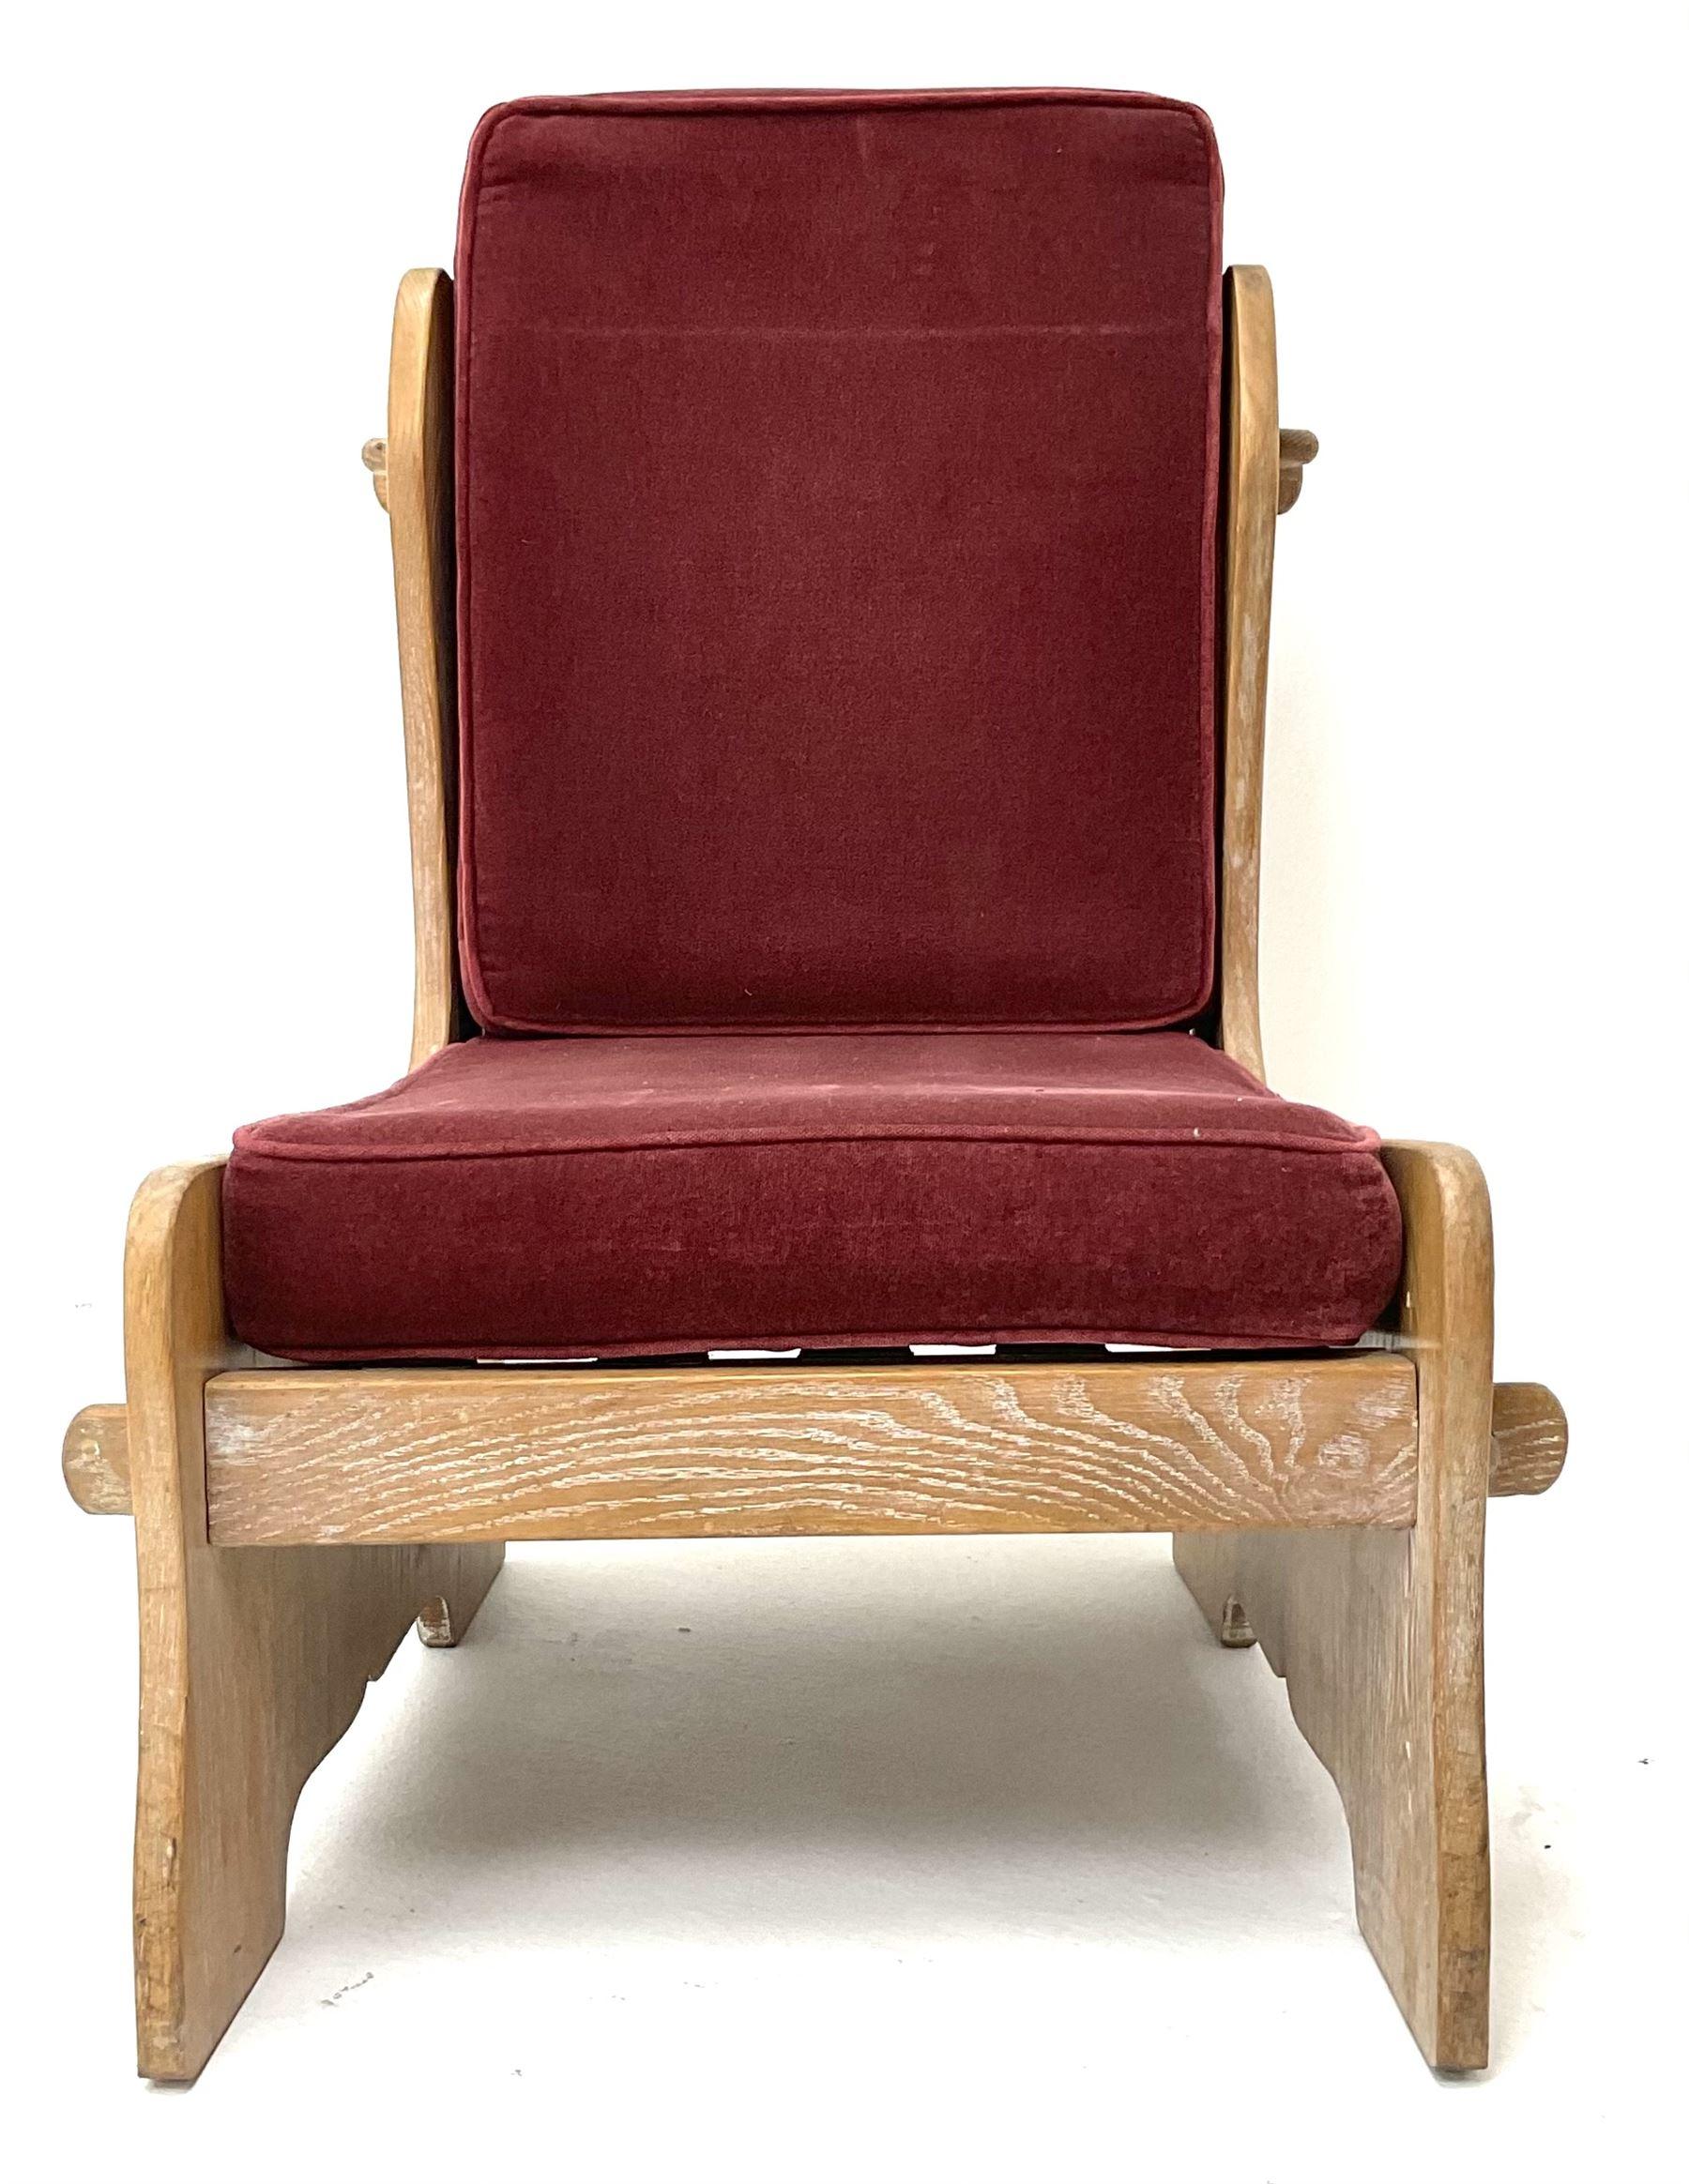 20th century oak chair